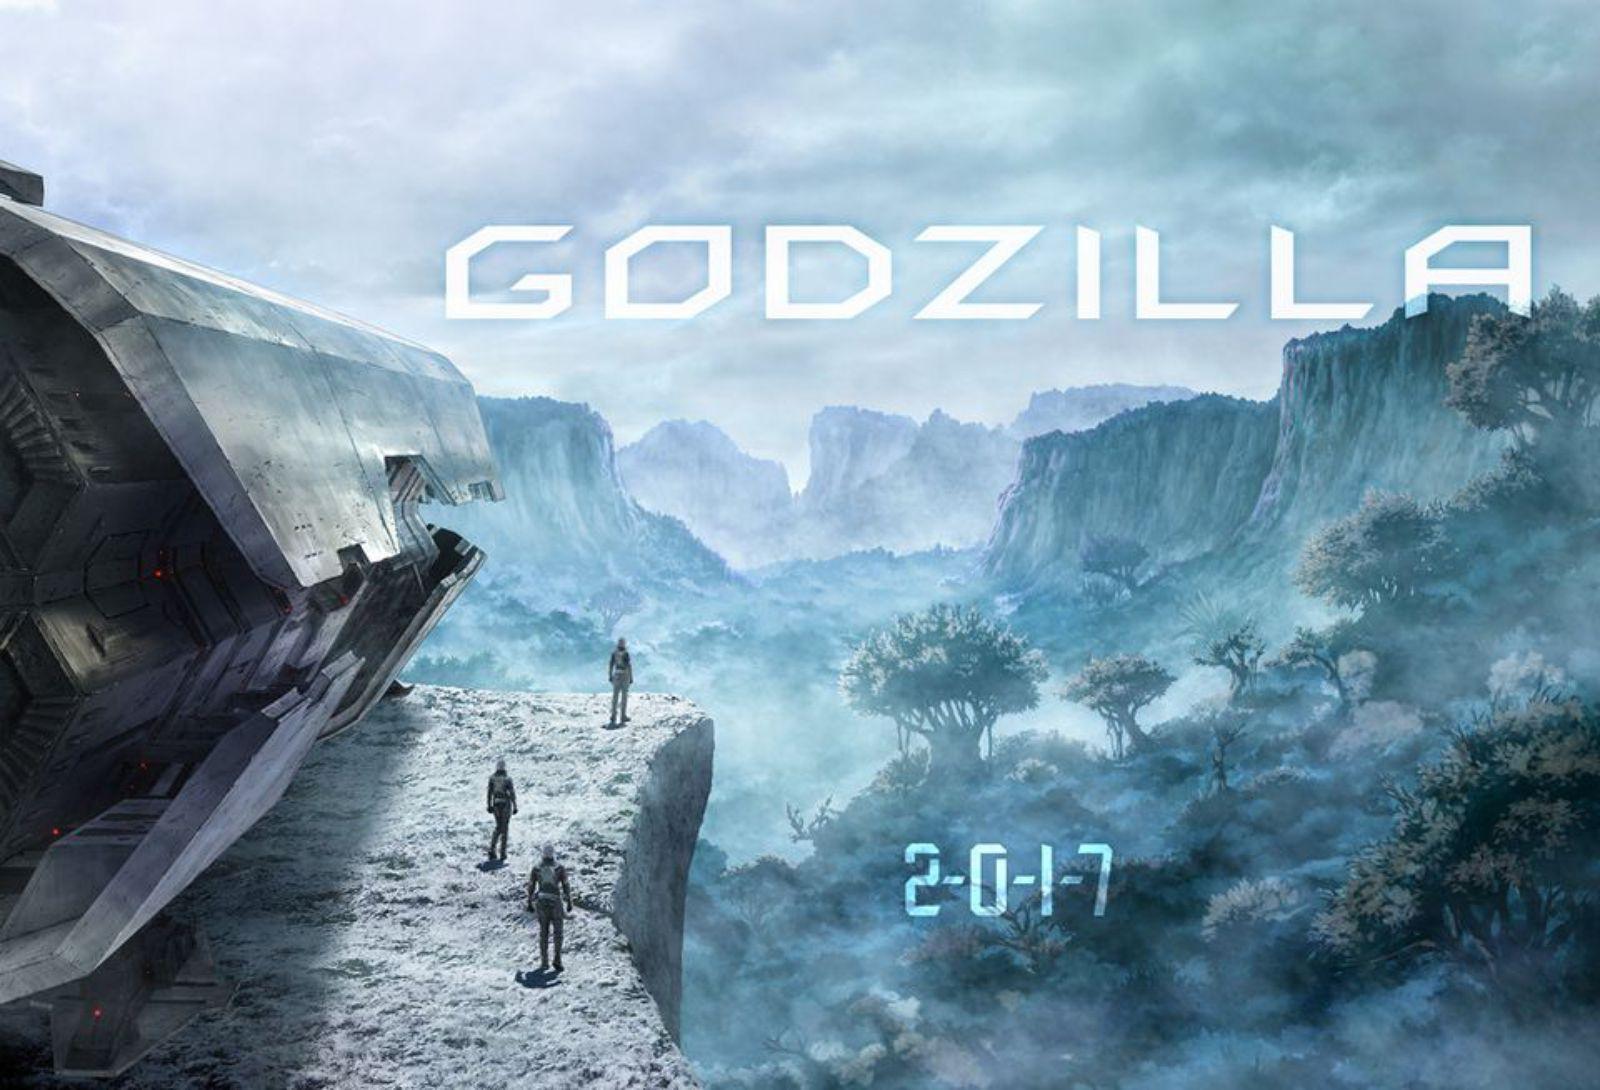 New Godzilla Anime Will Stream On Netflix in 2017